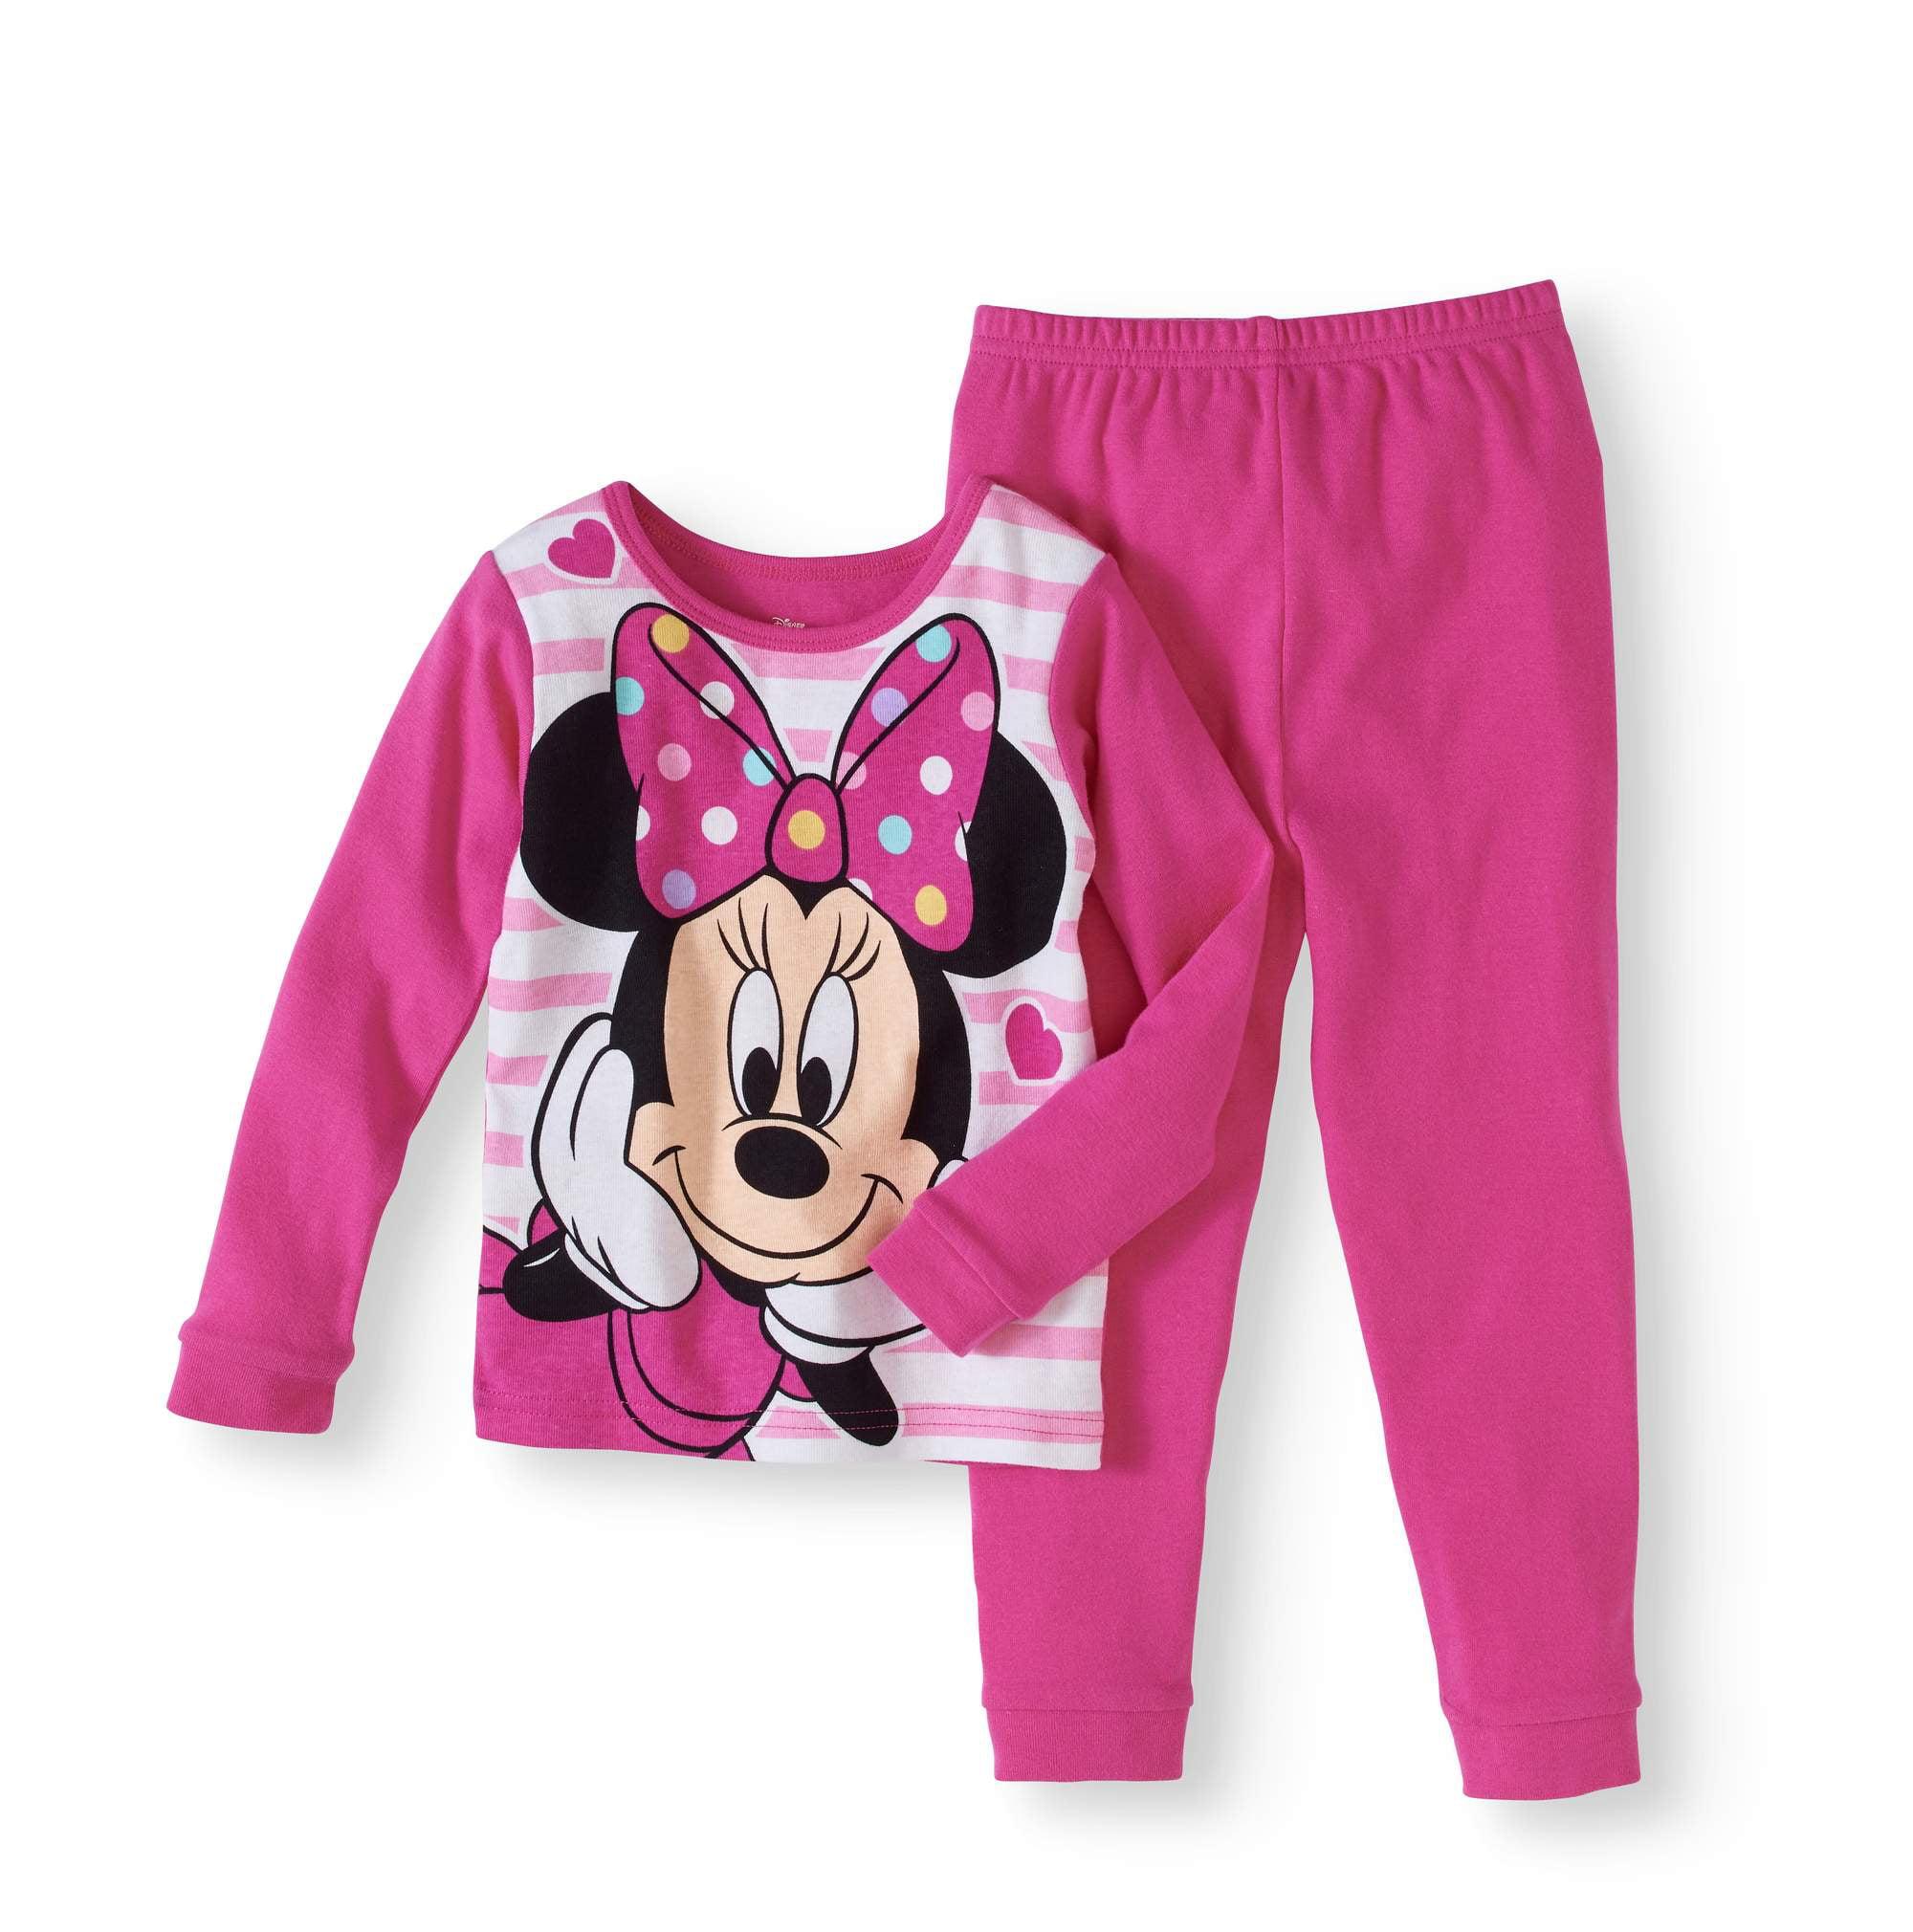 Baby Toddler Girl Cotton Tight Fit Pajama, 2pc Set